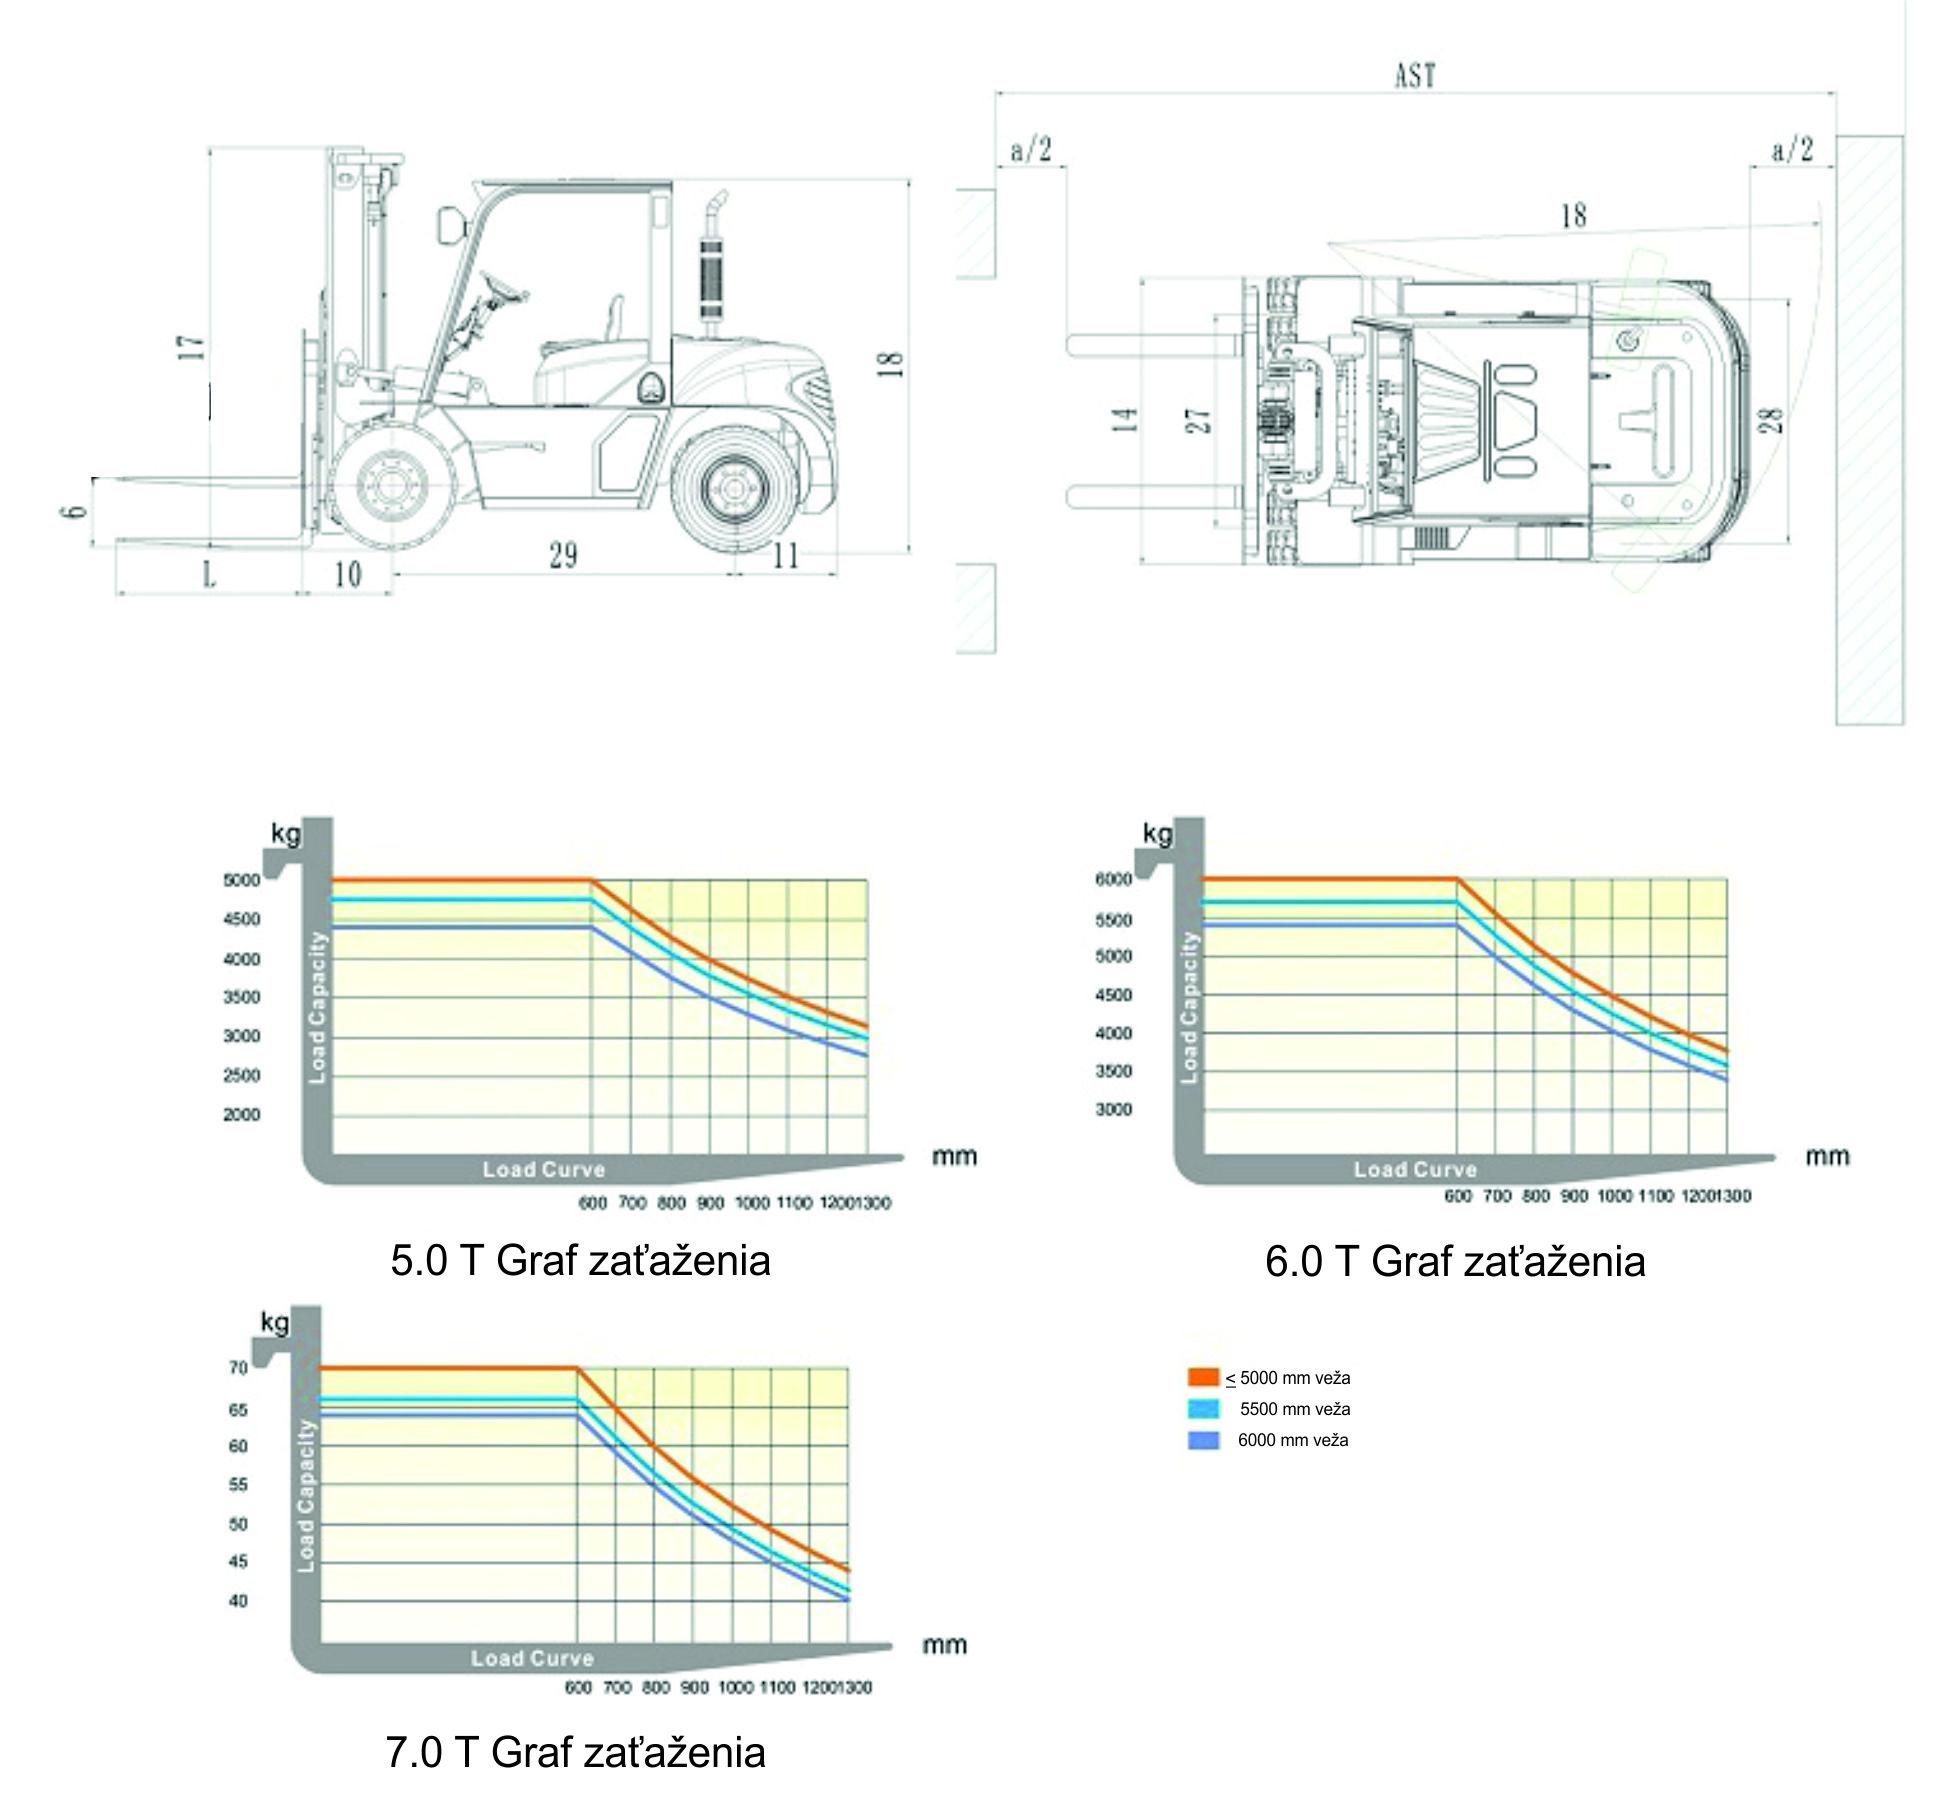 Graf zaťaženia_diesel_5.0 - 7.0 T